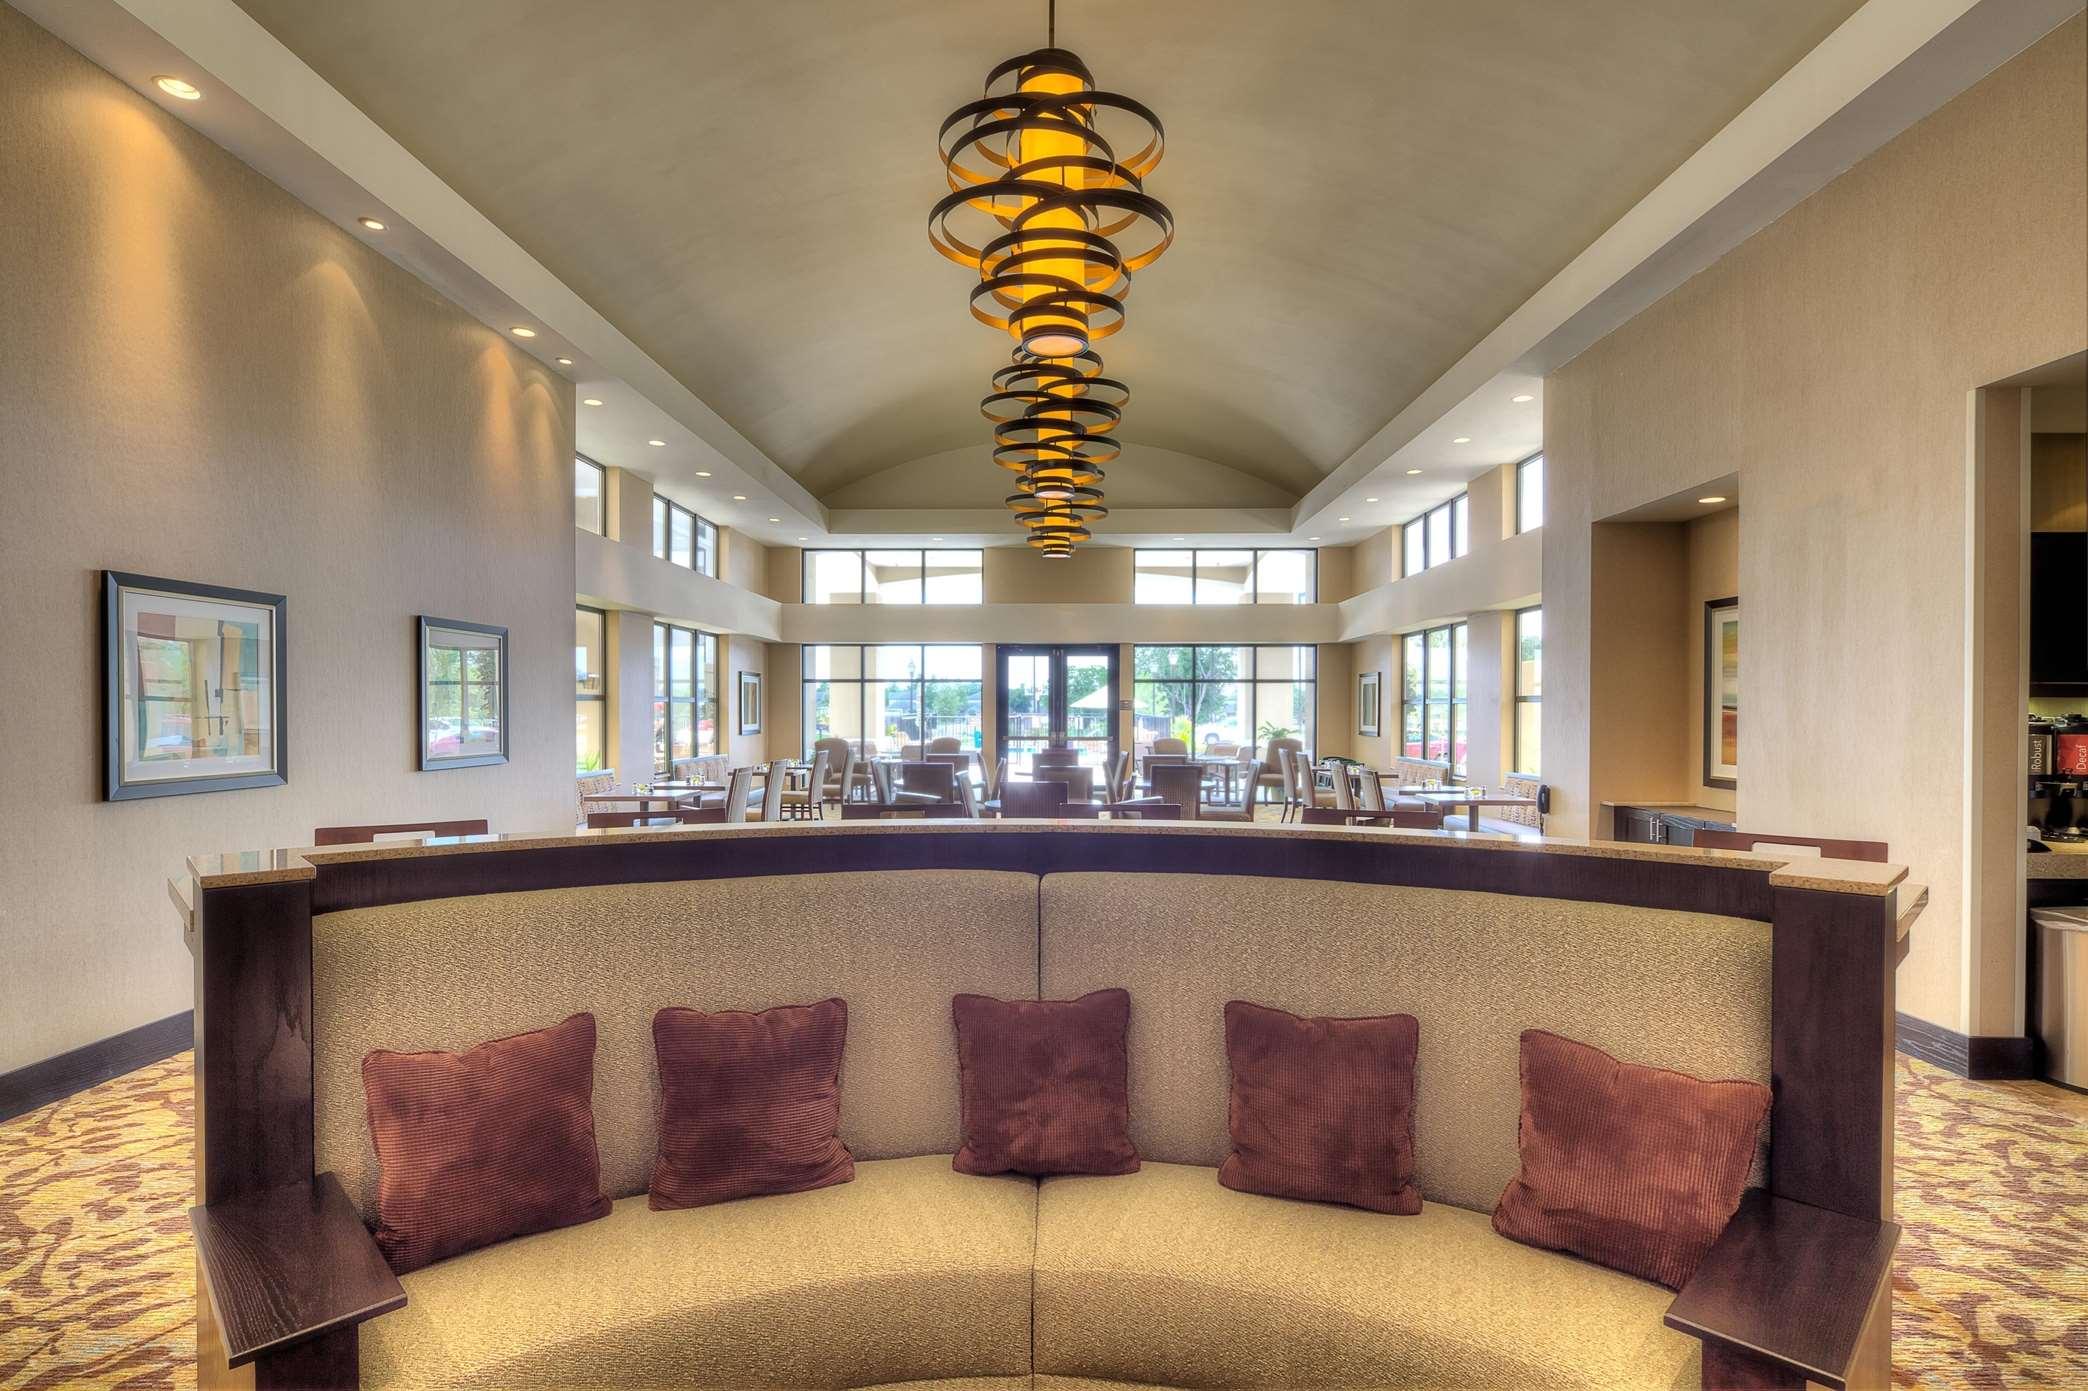 Homewood Suites by Hilton Victoria, TX image 6